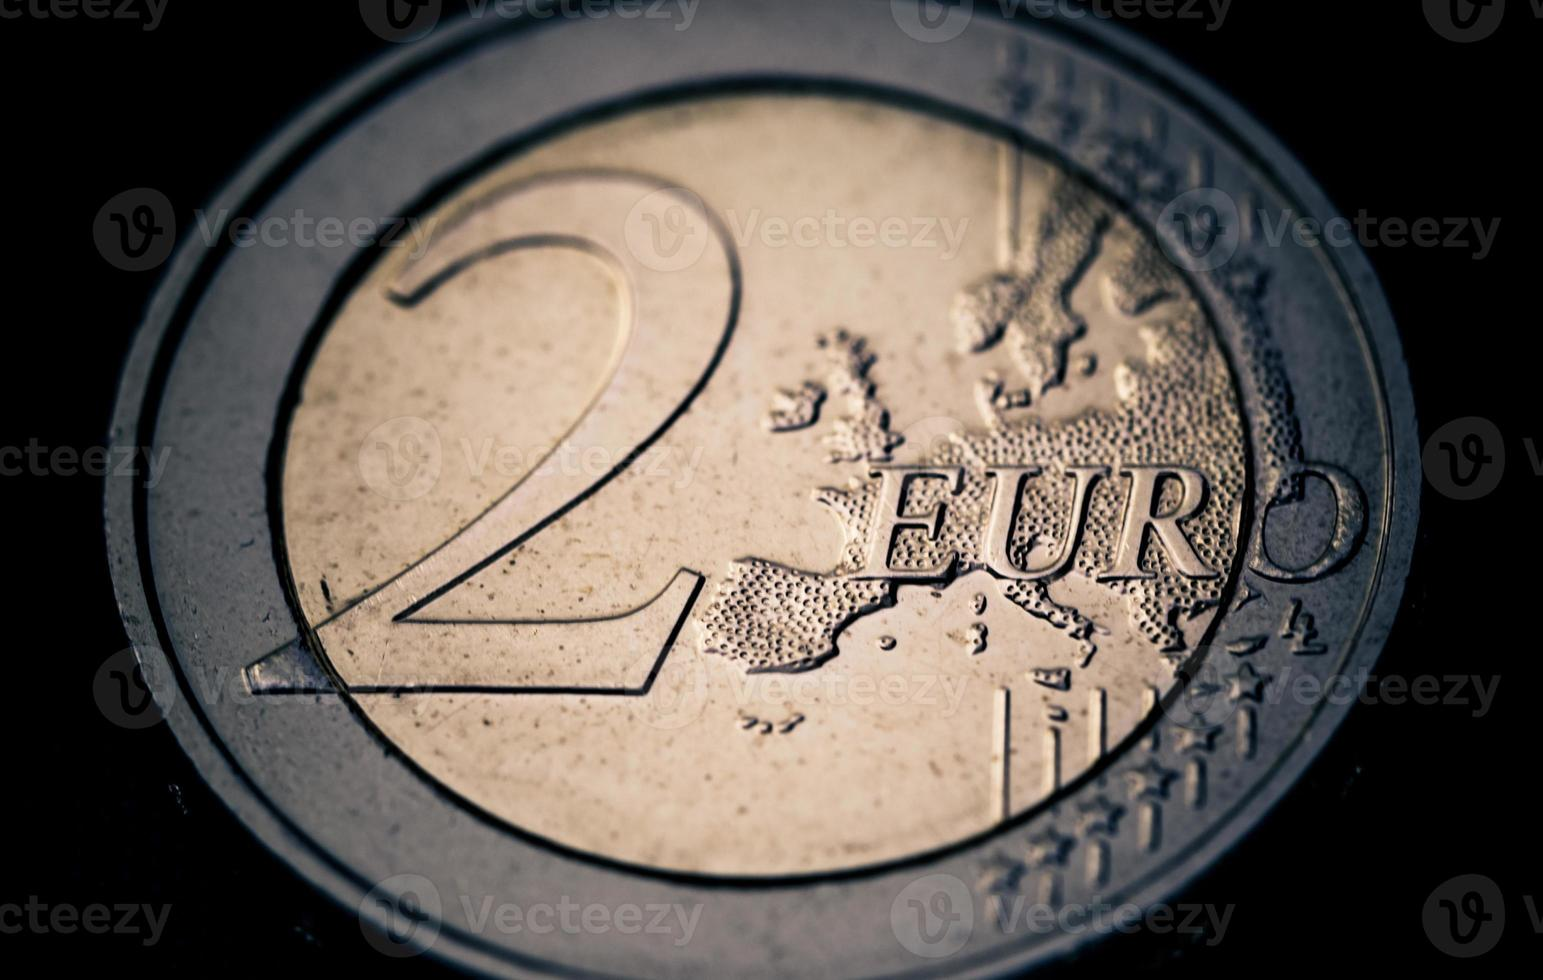 Munt van 2 euro foto